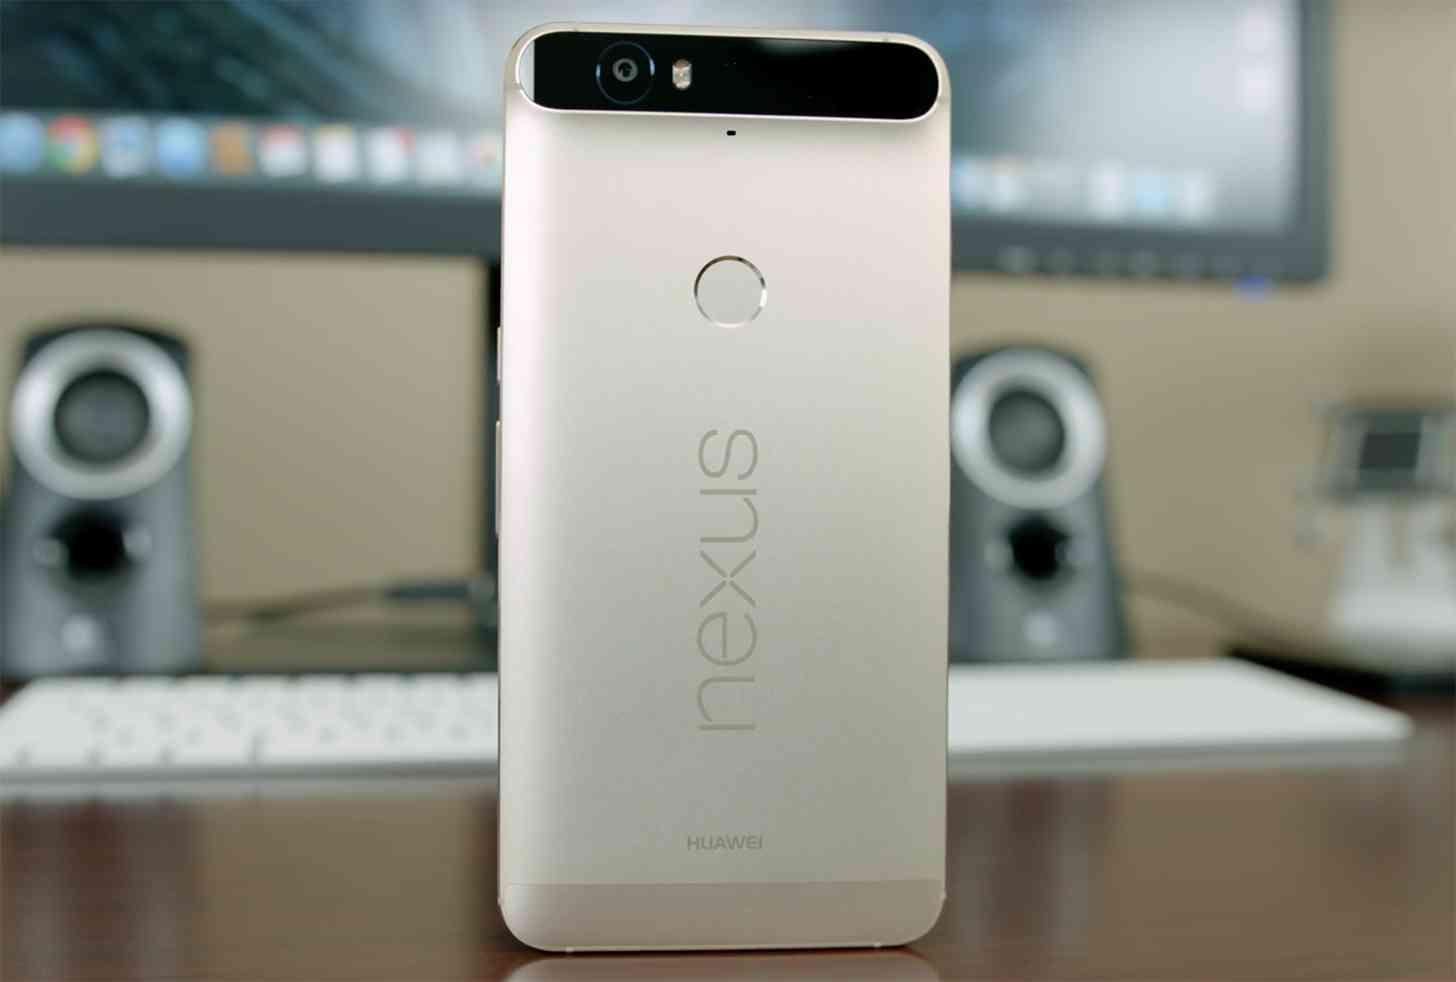 Nexus 6P Matte Gold hands-on